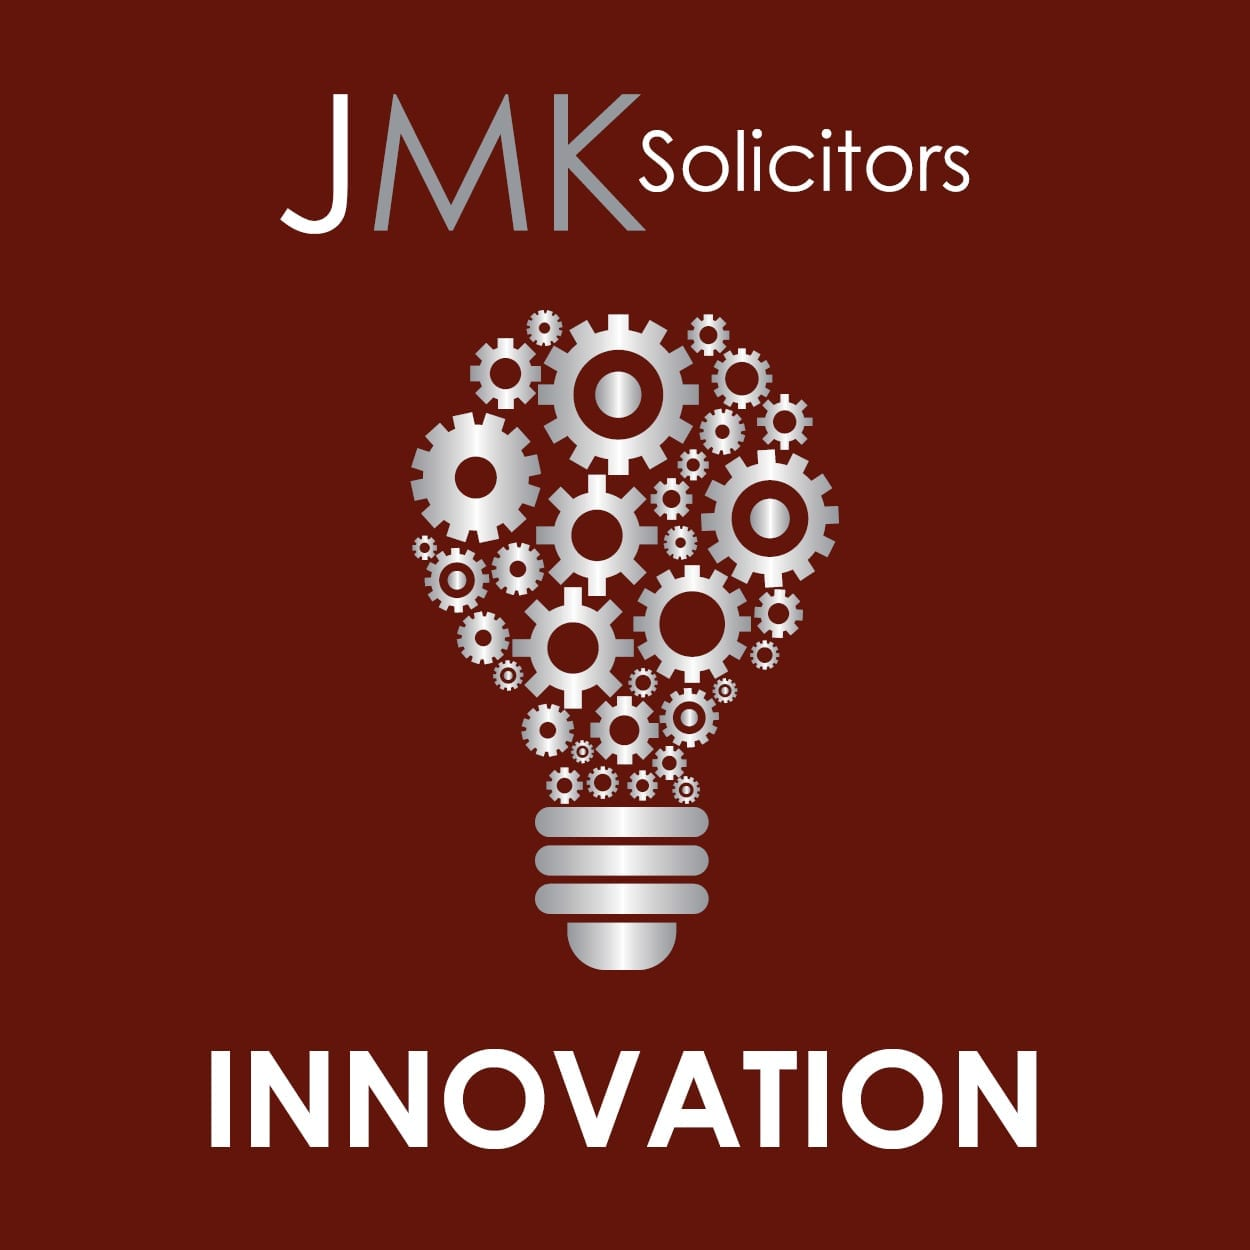 Innovation JMK Solicitors Values